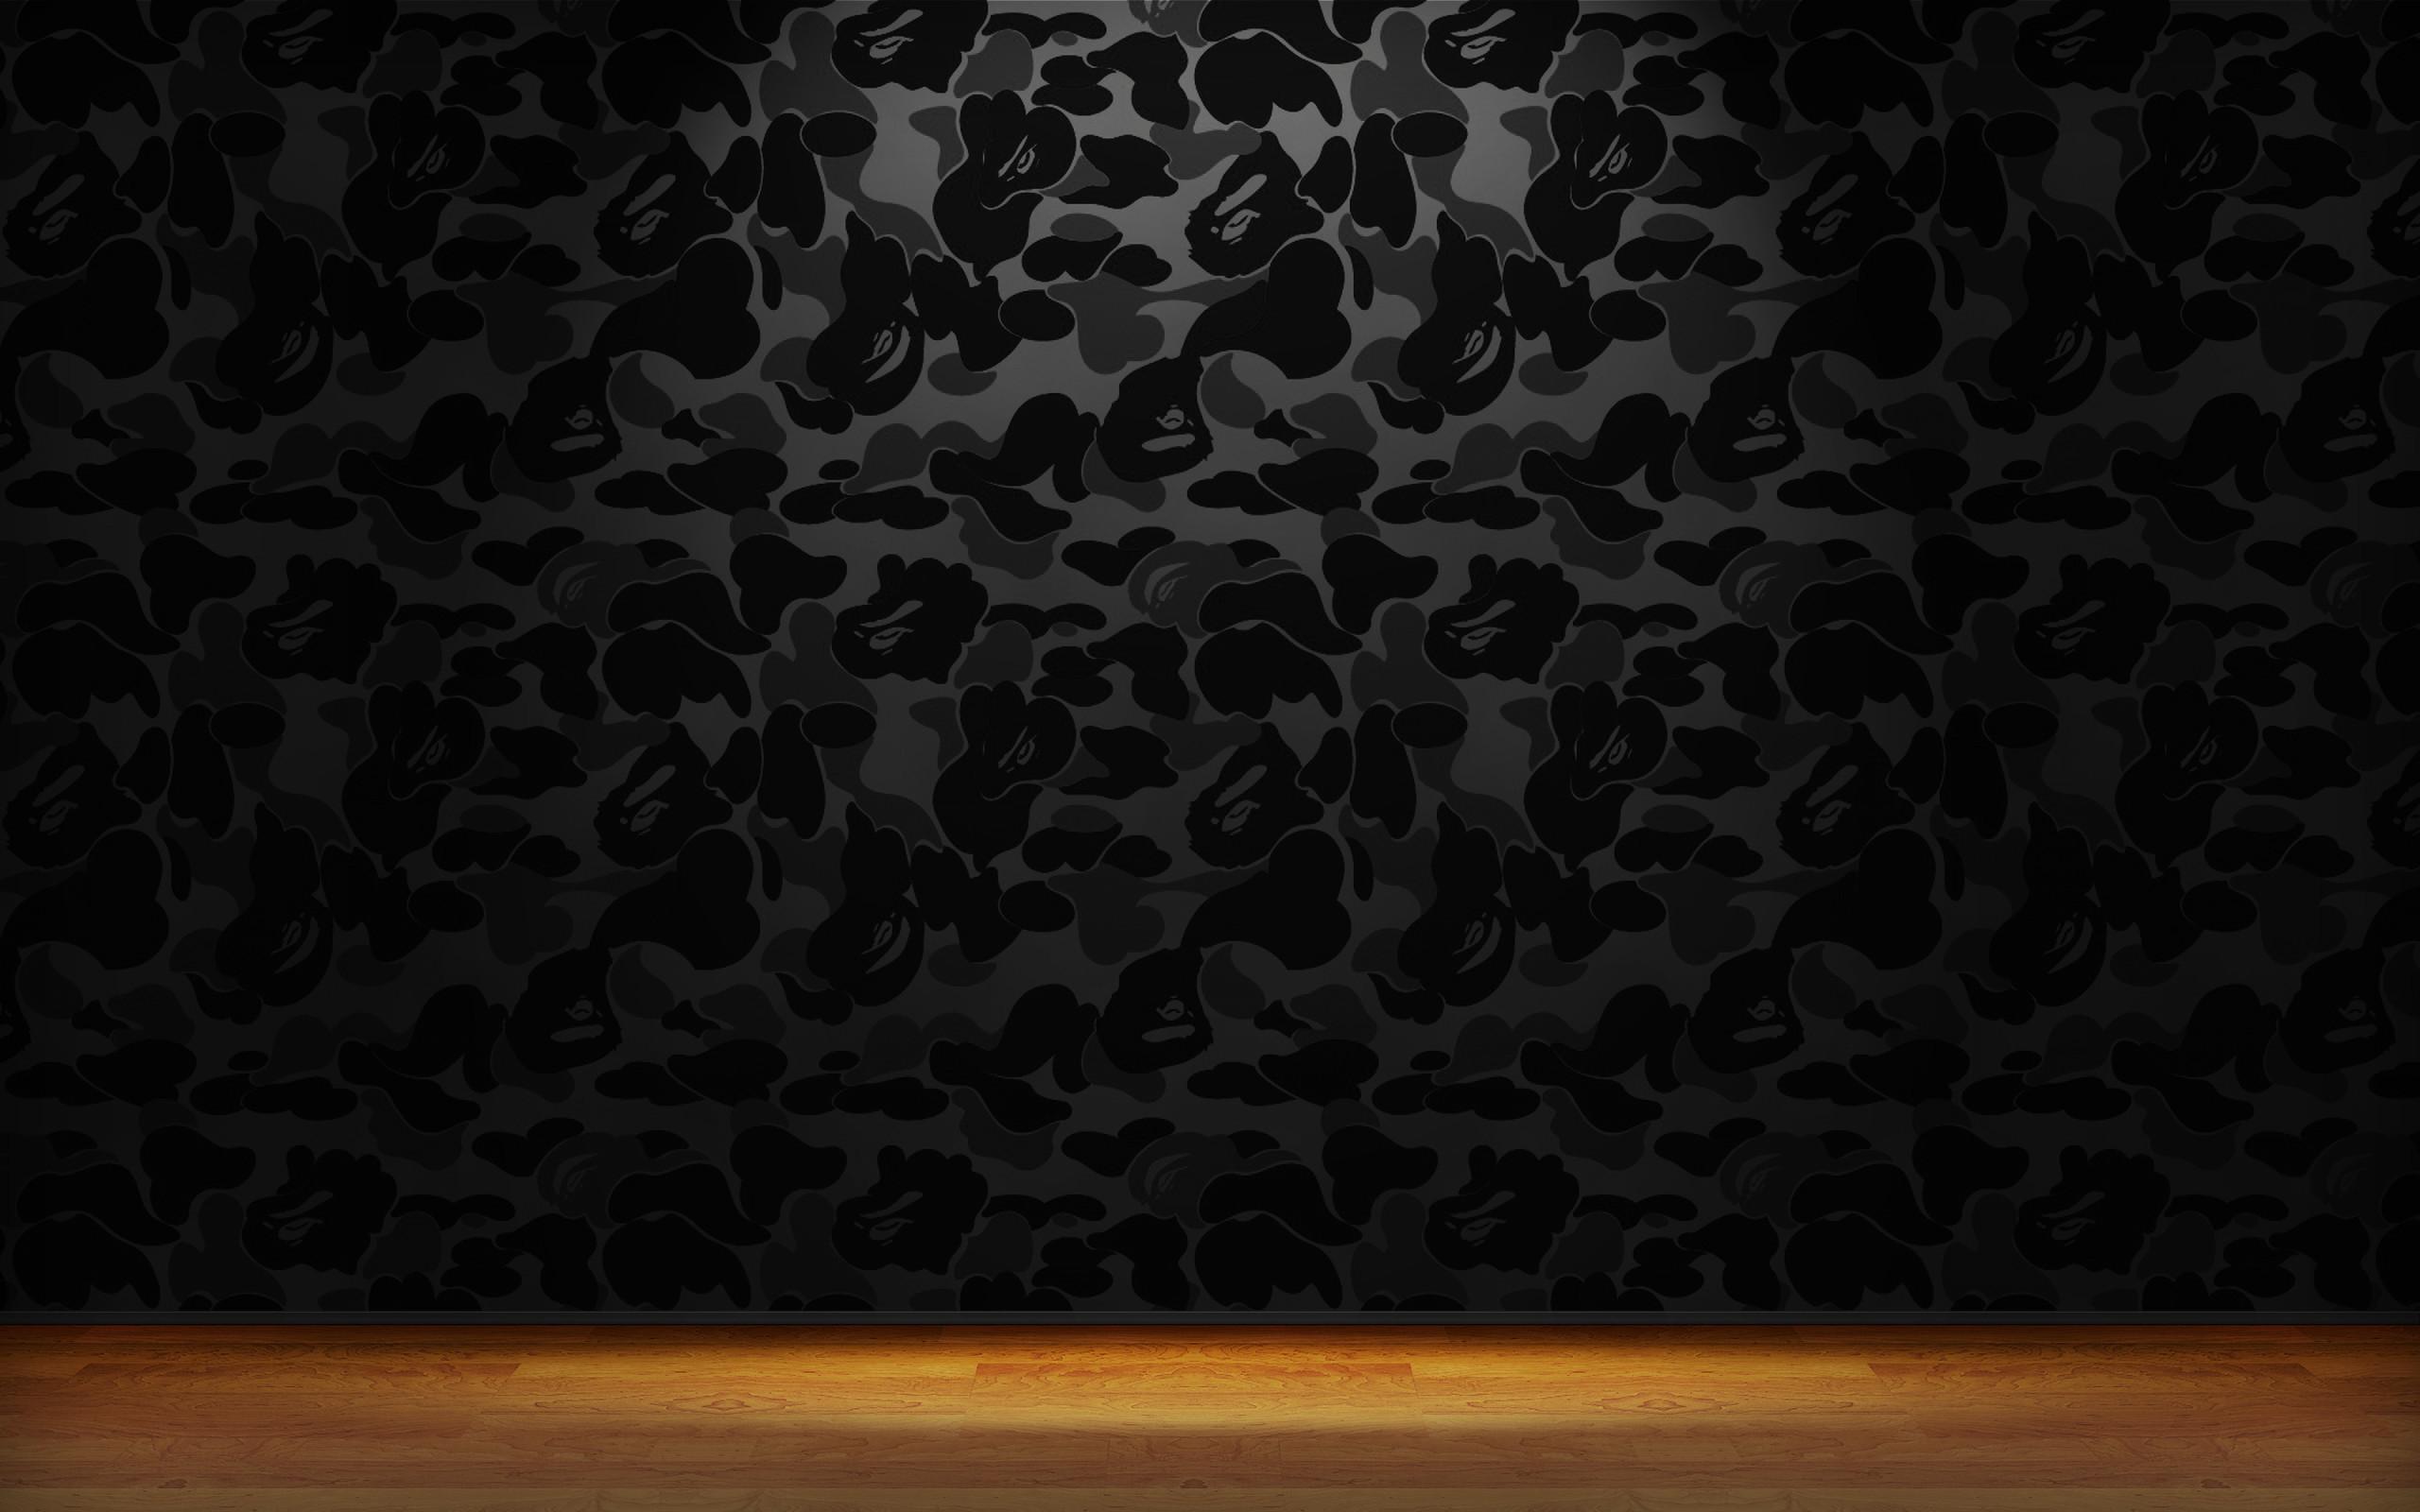 Bape Wallpaper Bape unbricked by